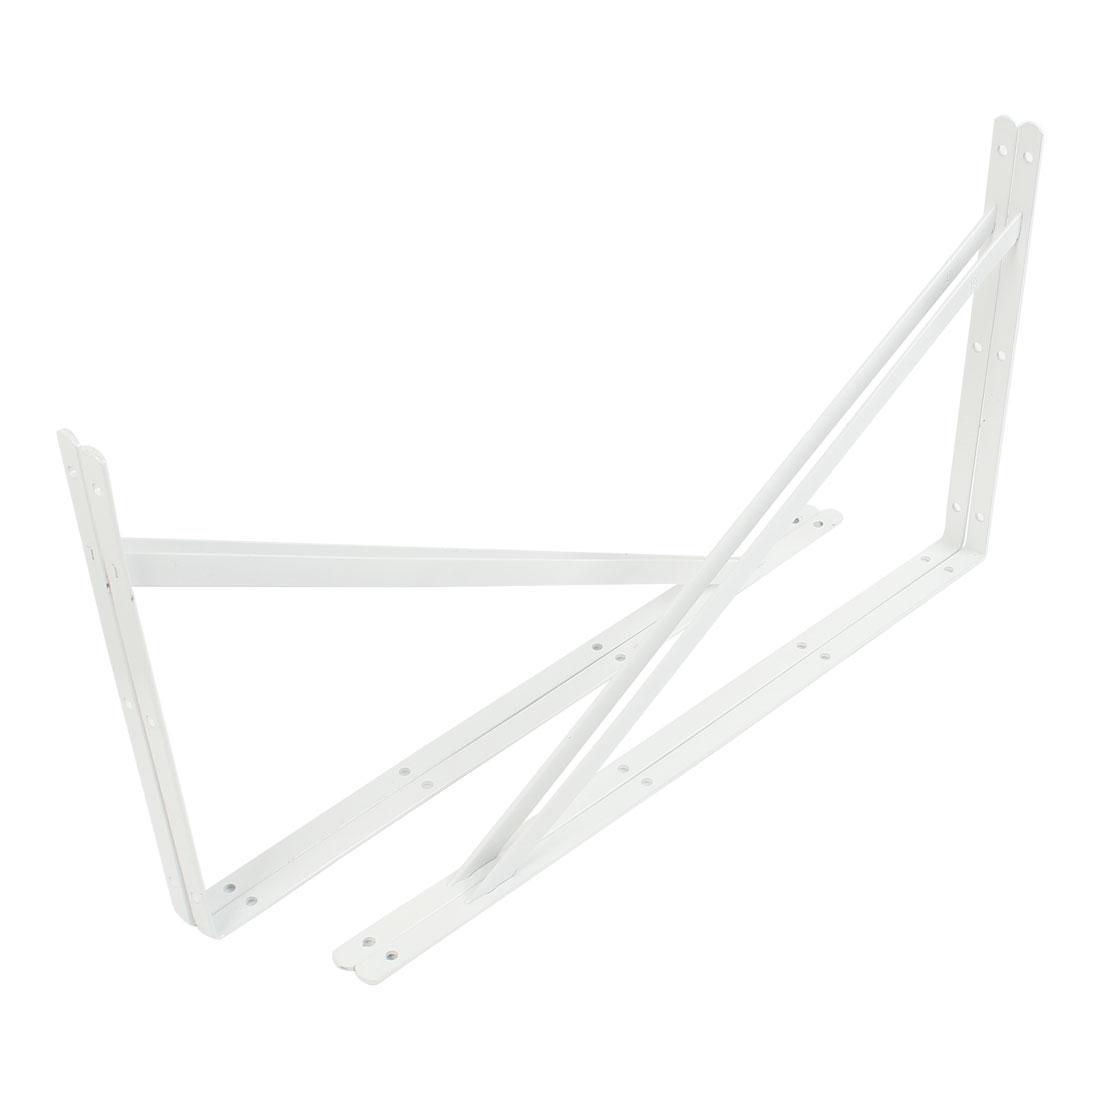 50cmx30cm White L Shaped Book Goods Holder Shelf Bracket Support 2 Pcs